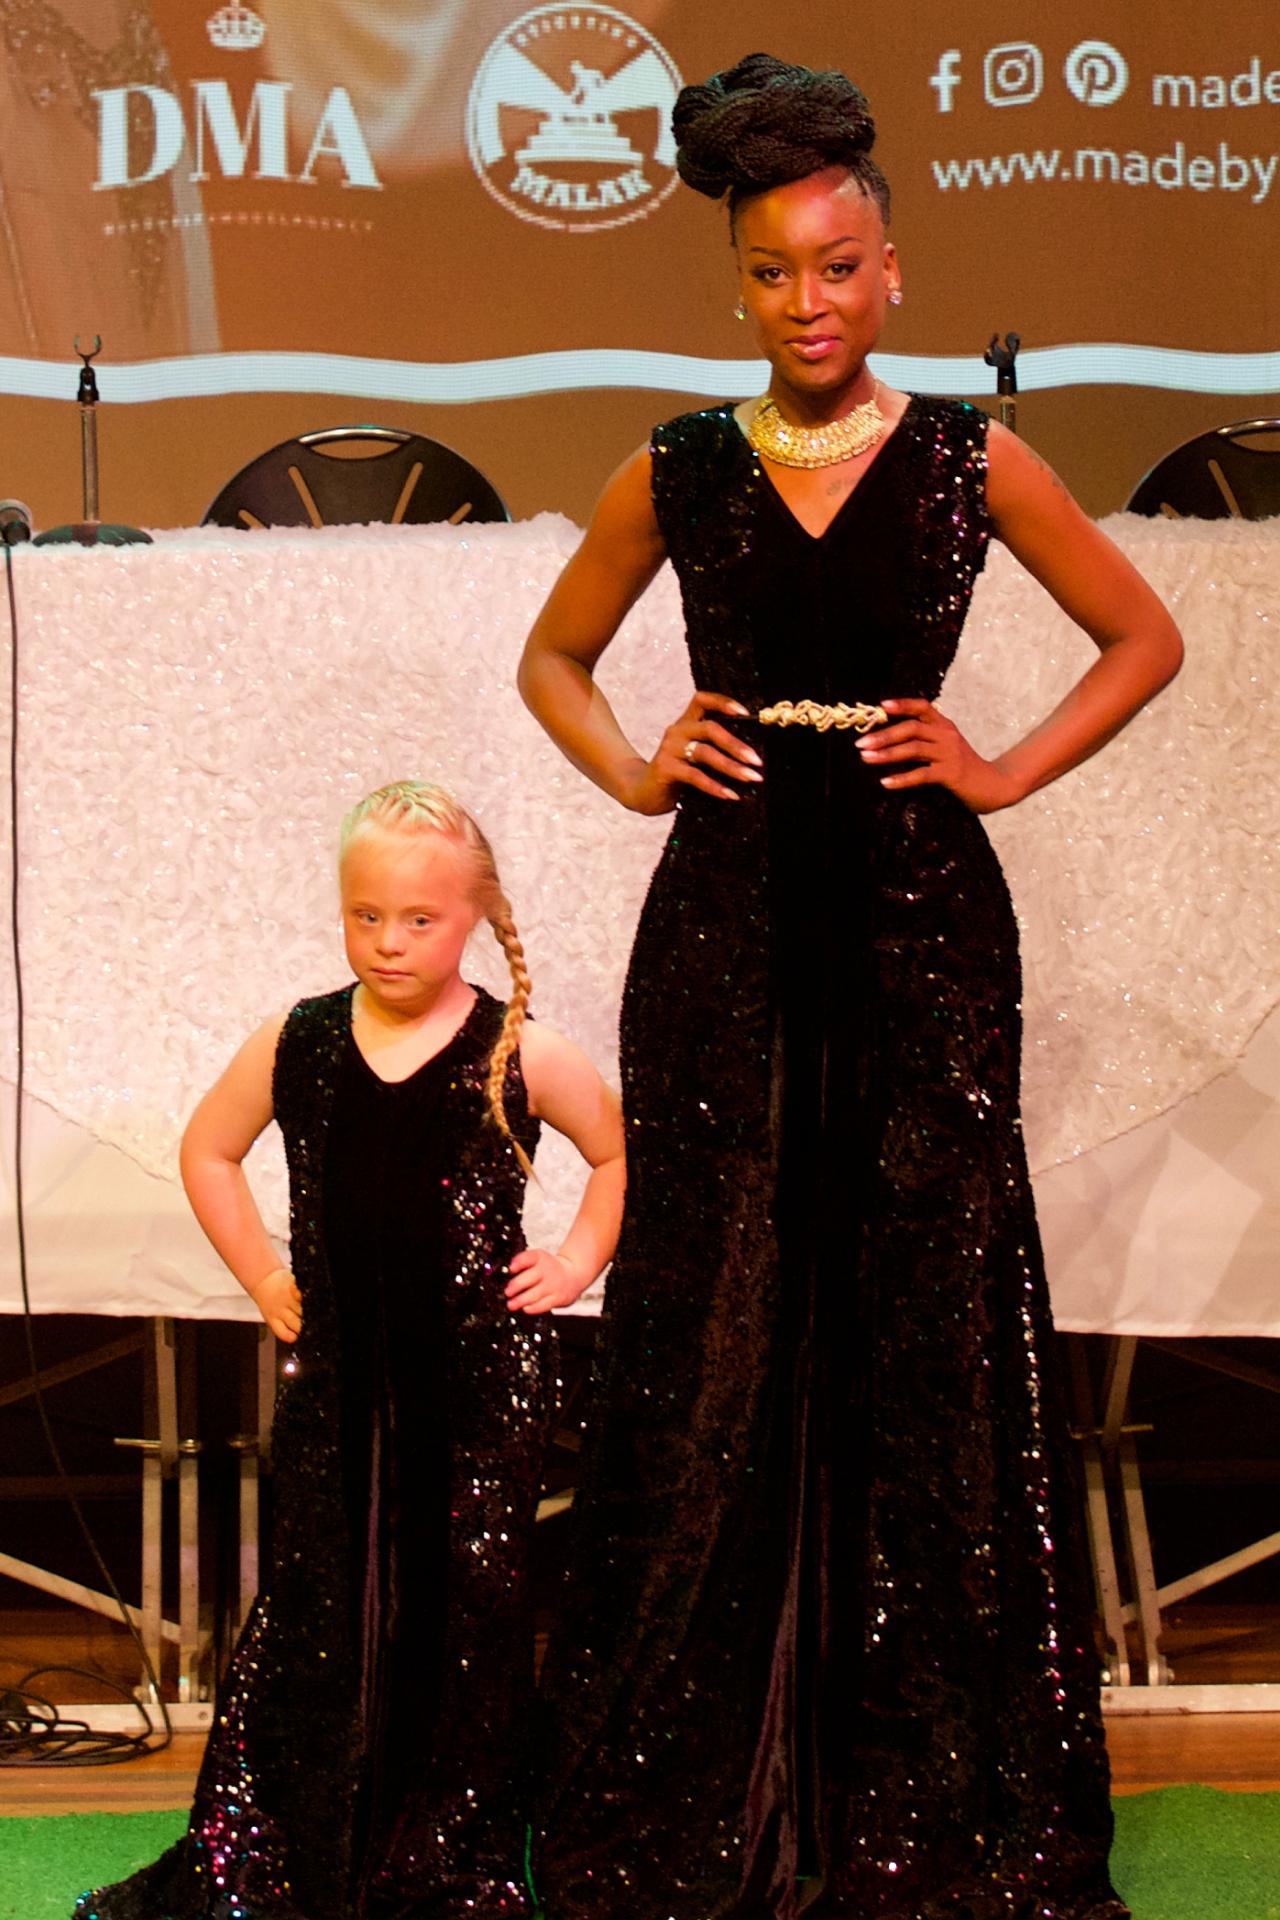 Zwarte V-hals jurk pailletjes